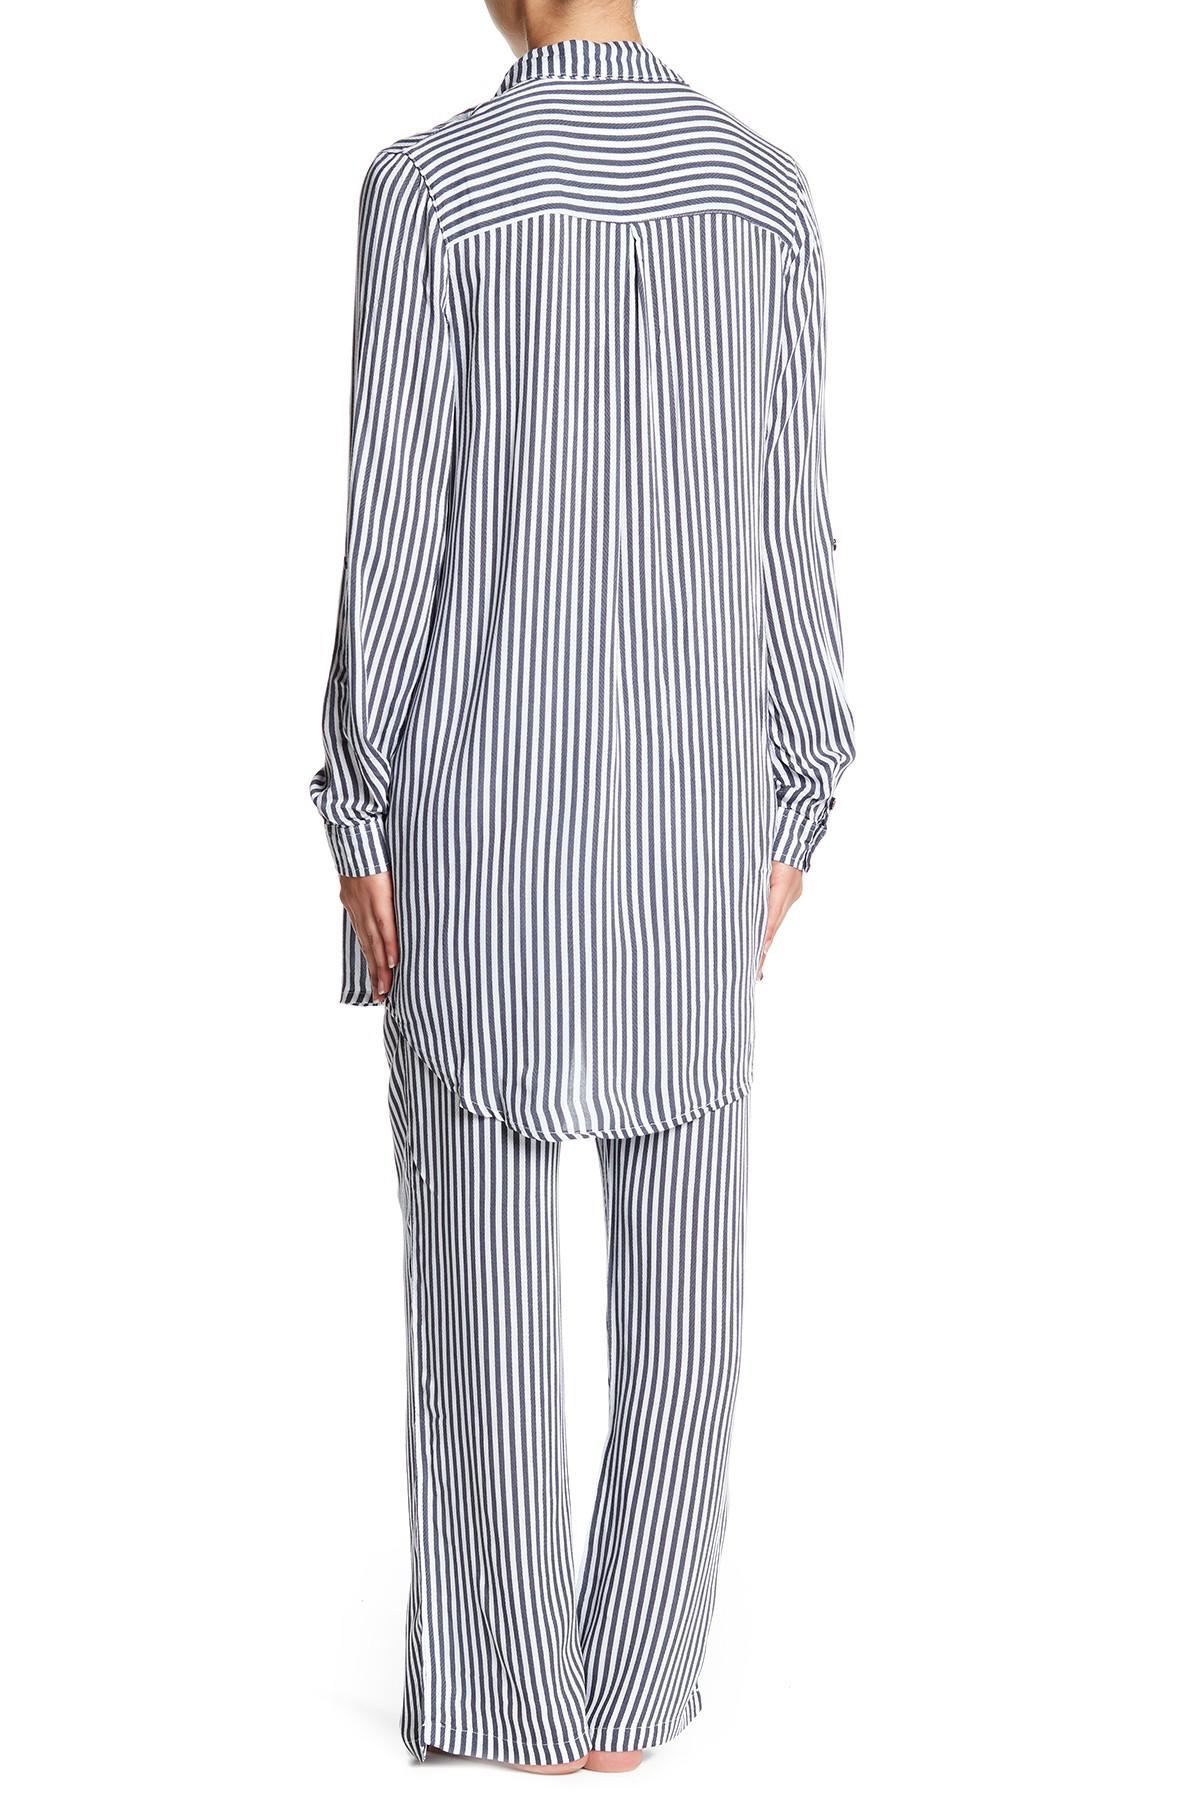 b255d4c6ff Lyst - Pj Salvage Simple Stripes Nightshirt in Gray